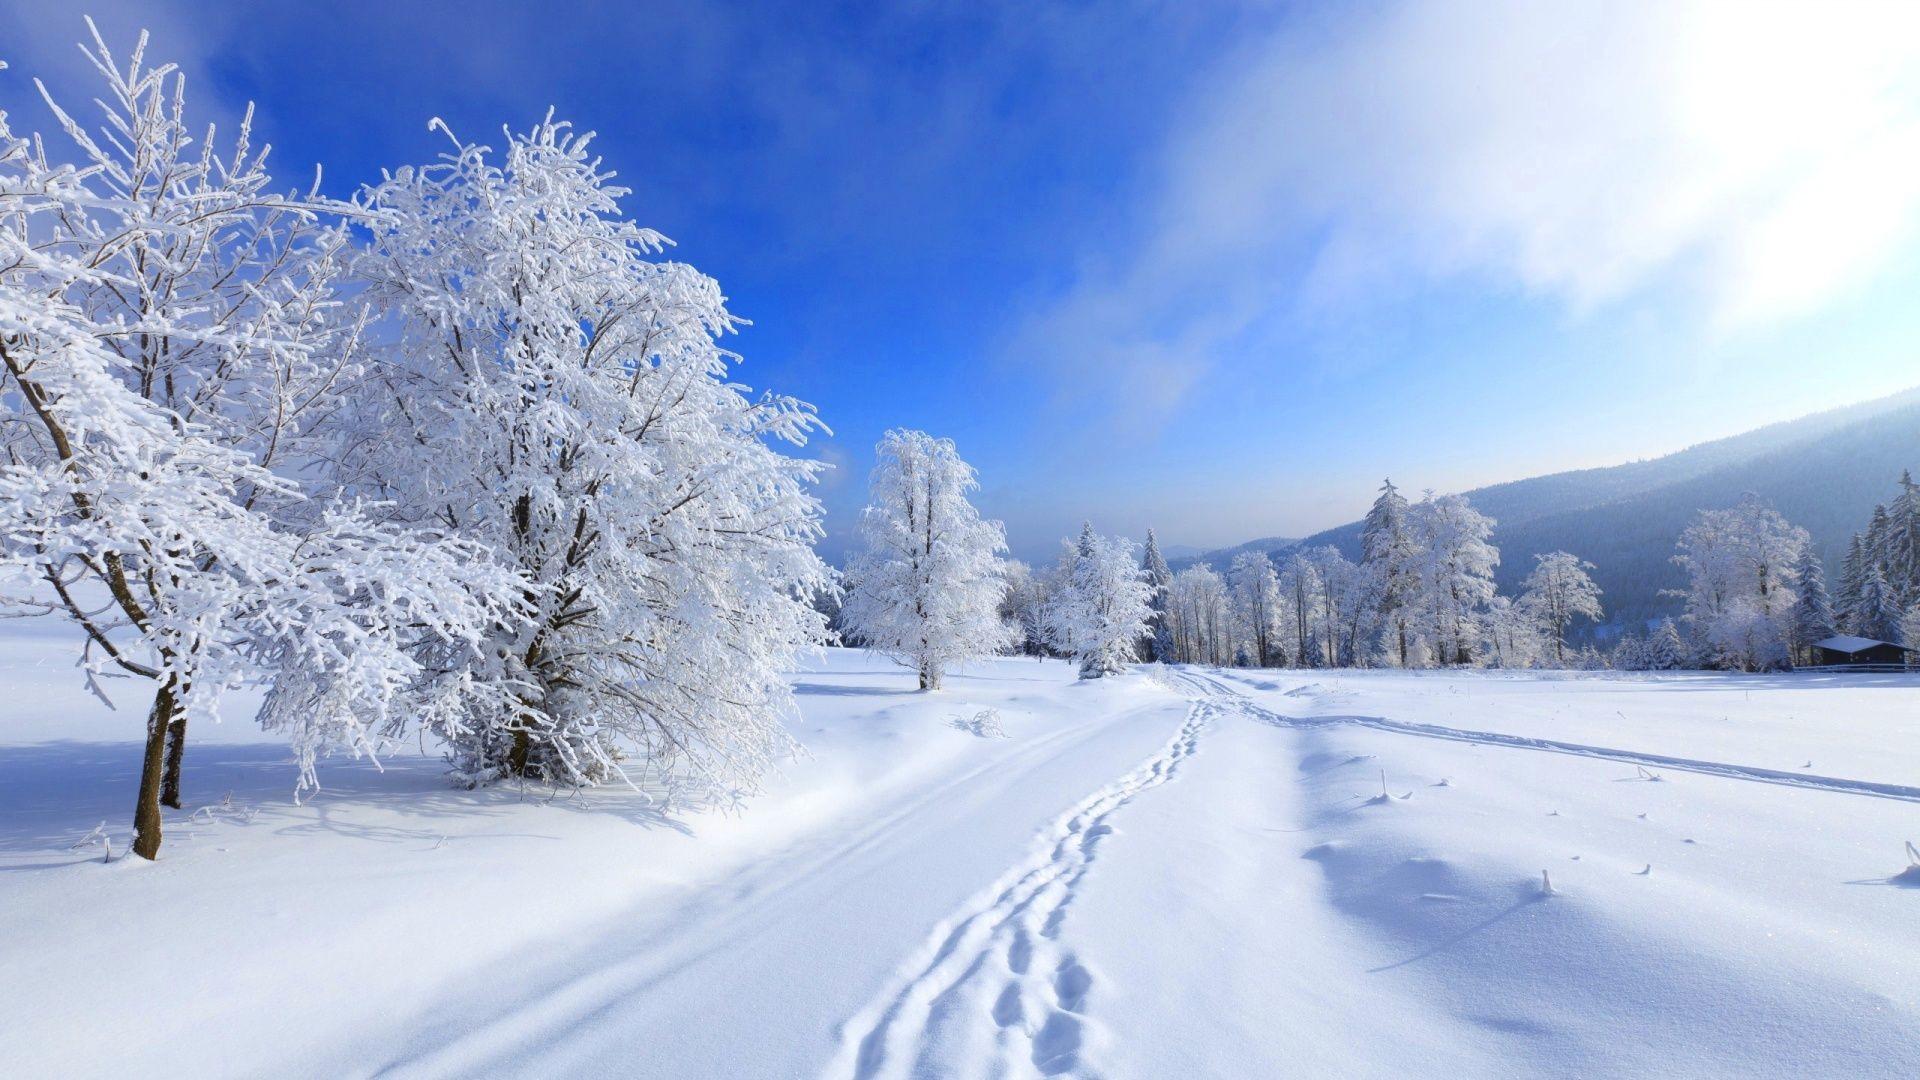 Download 5 Free Winter Wallpaper …